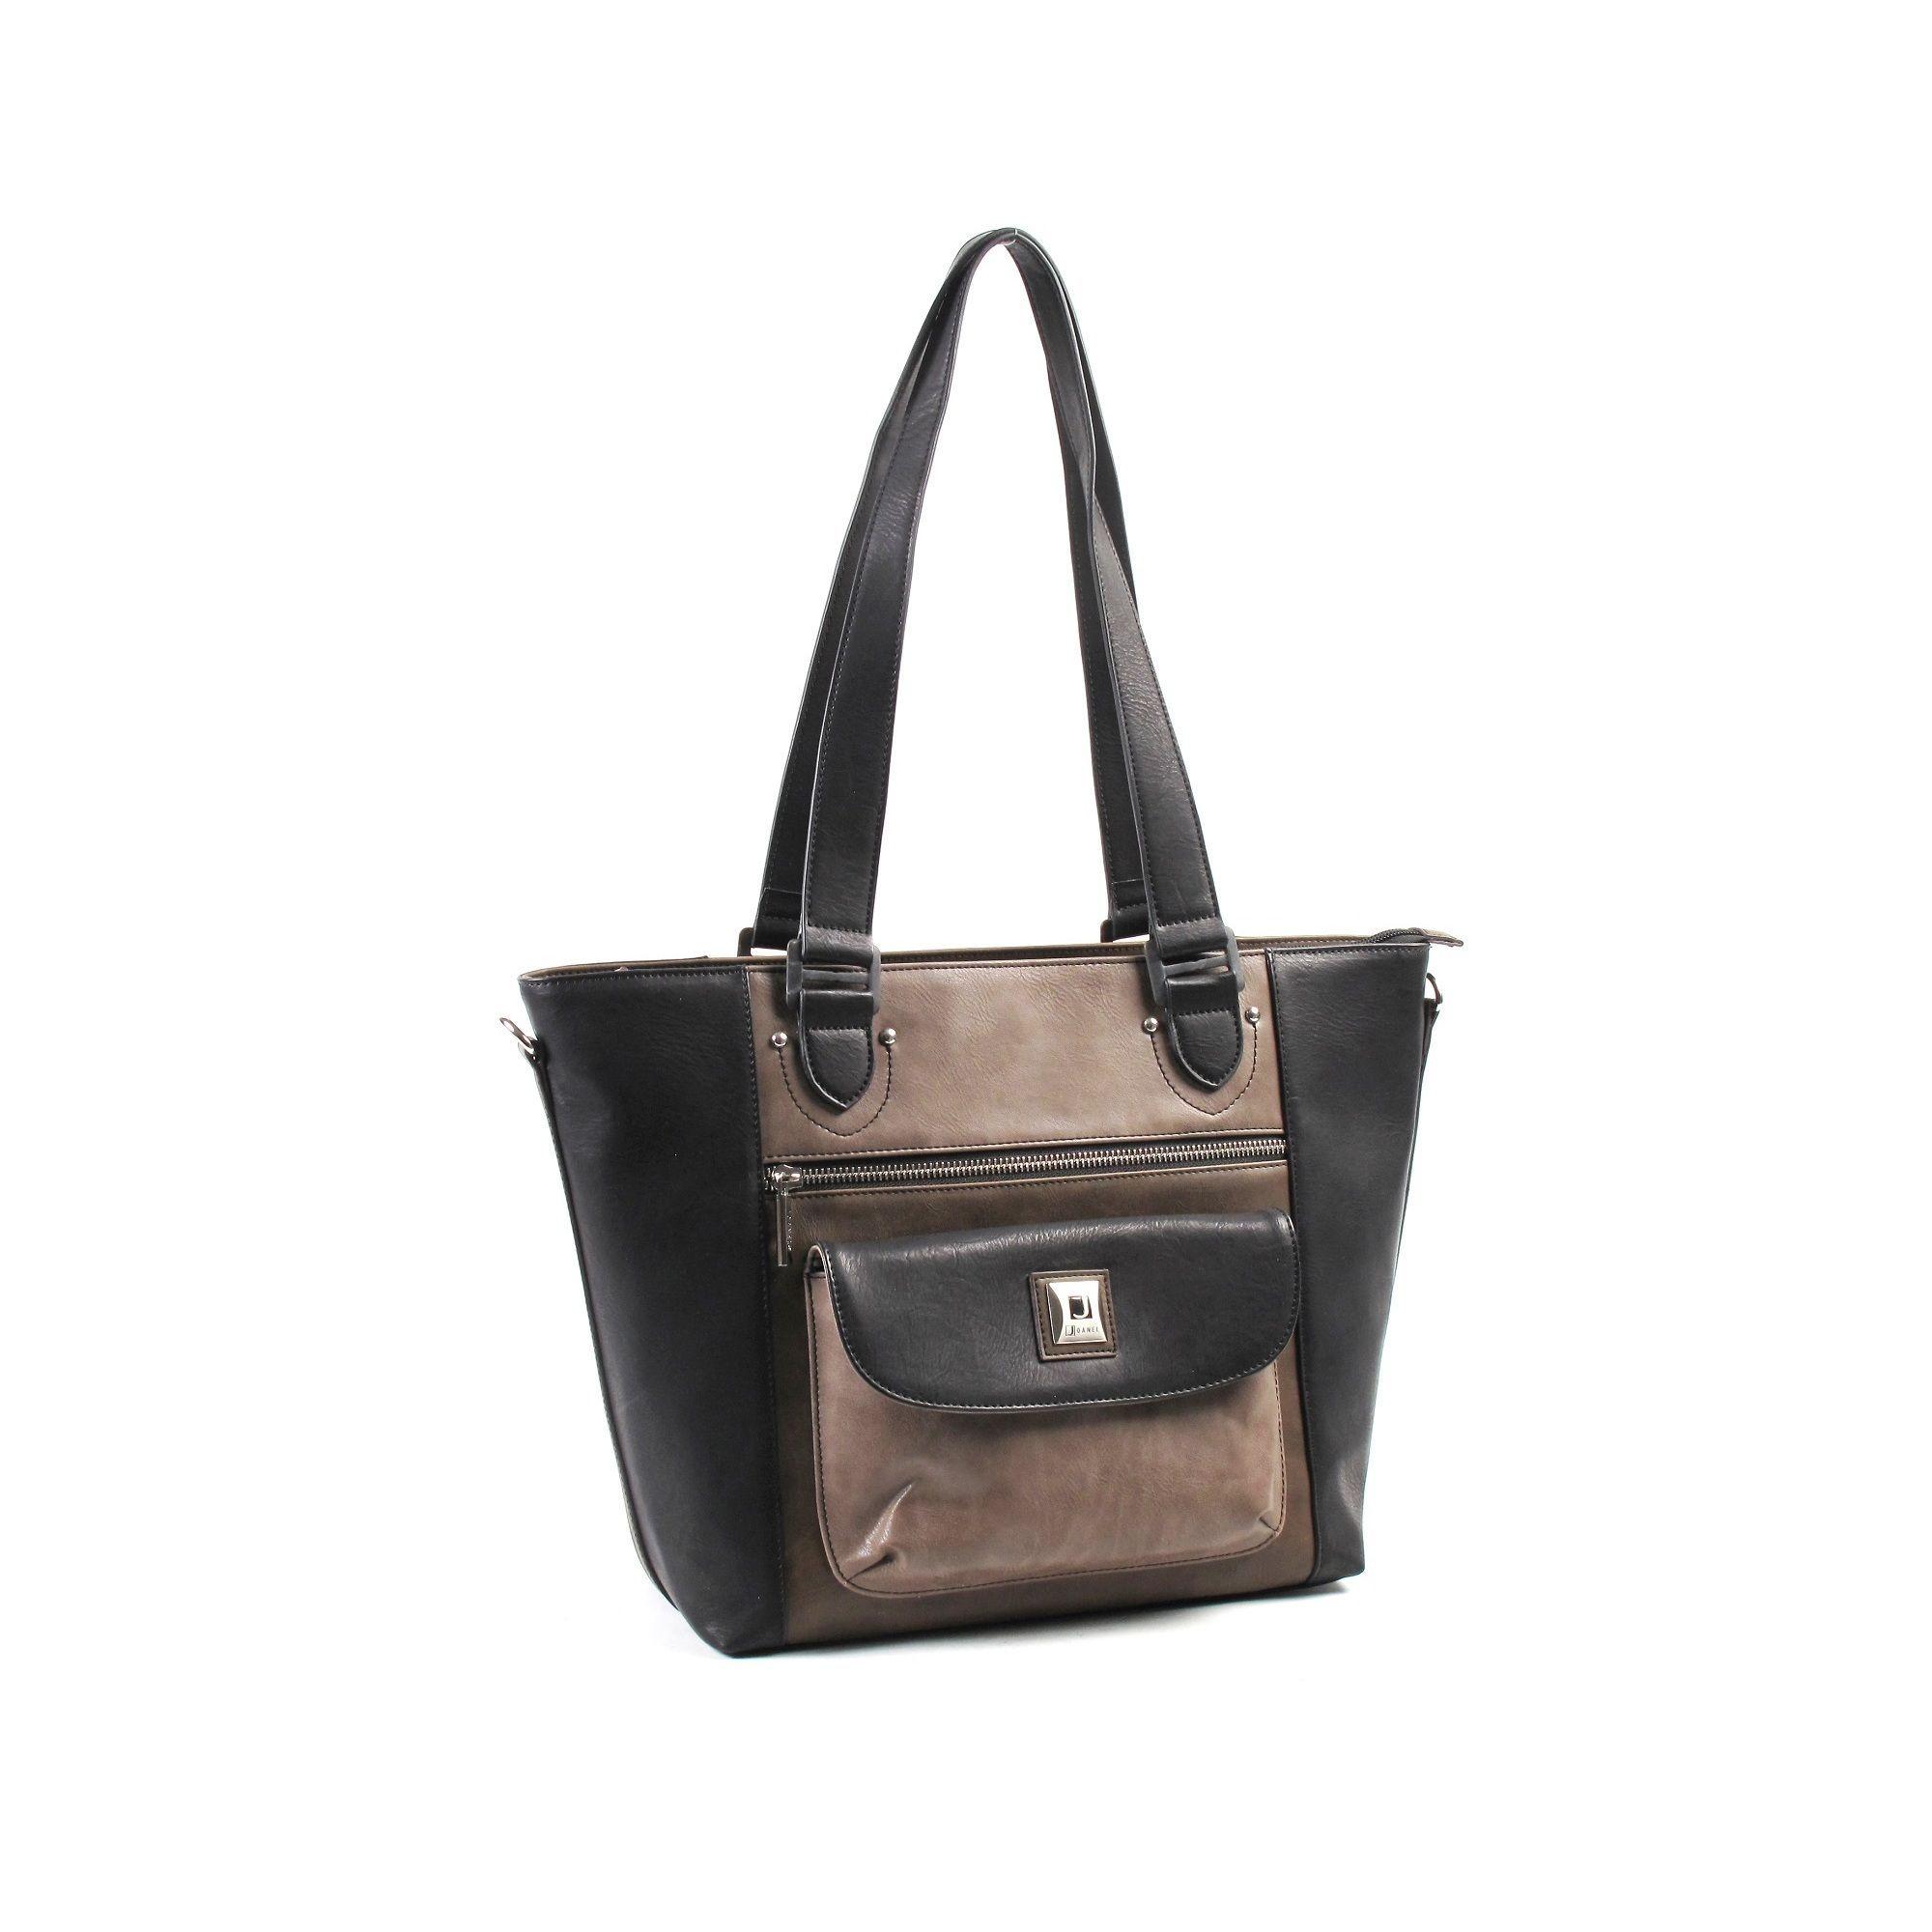 Joanel Tote Bag